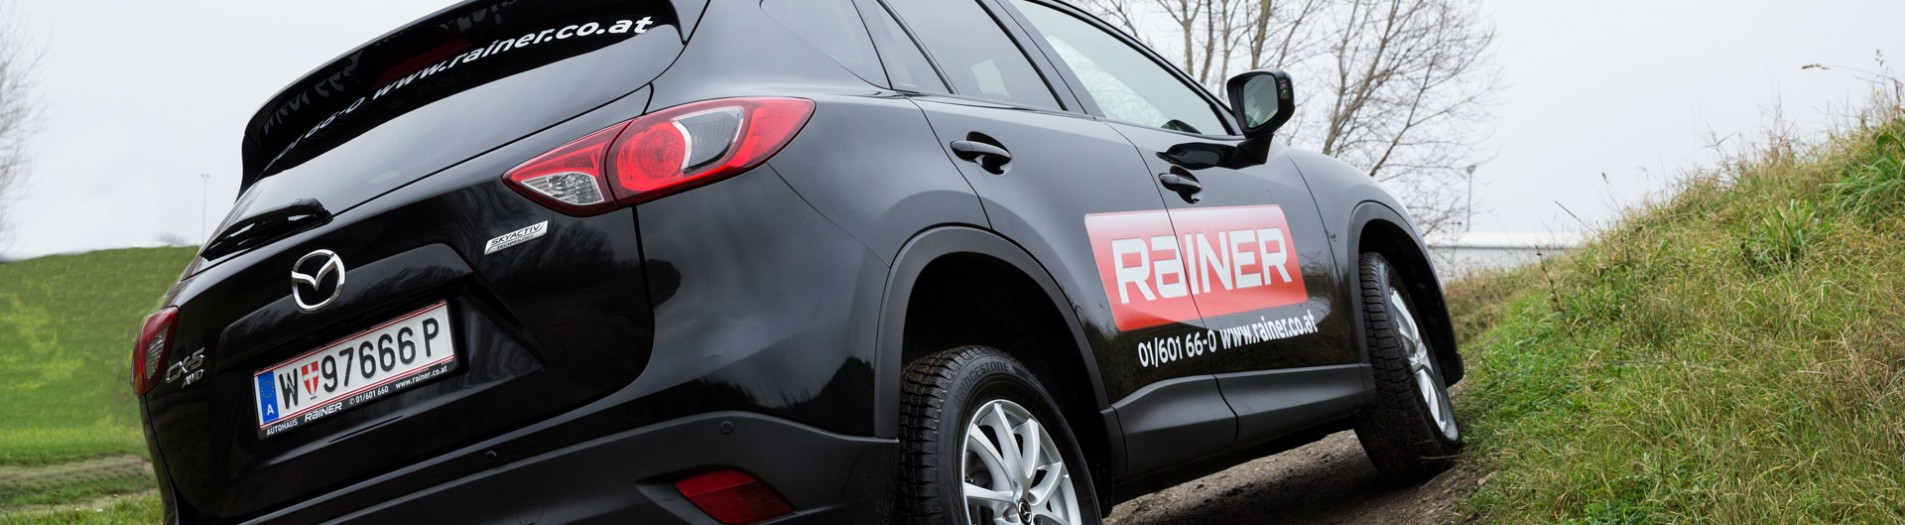 Mazda Rainer